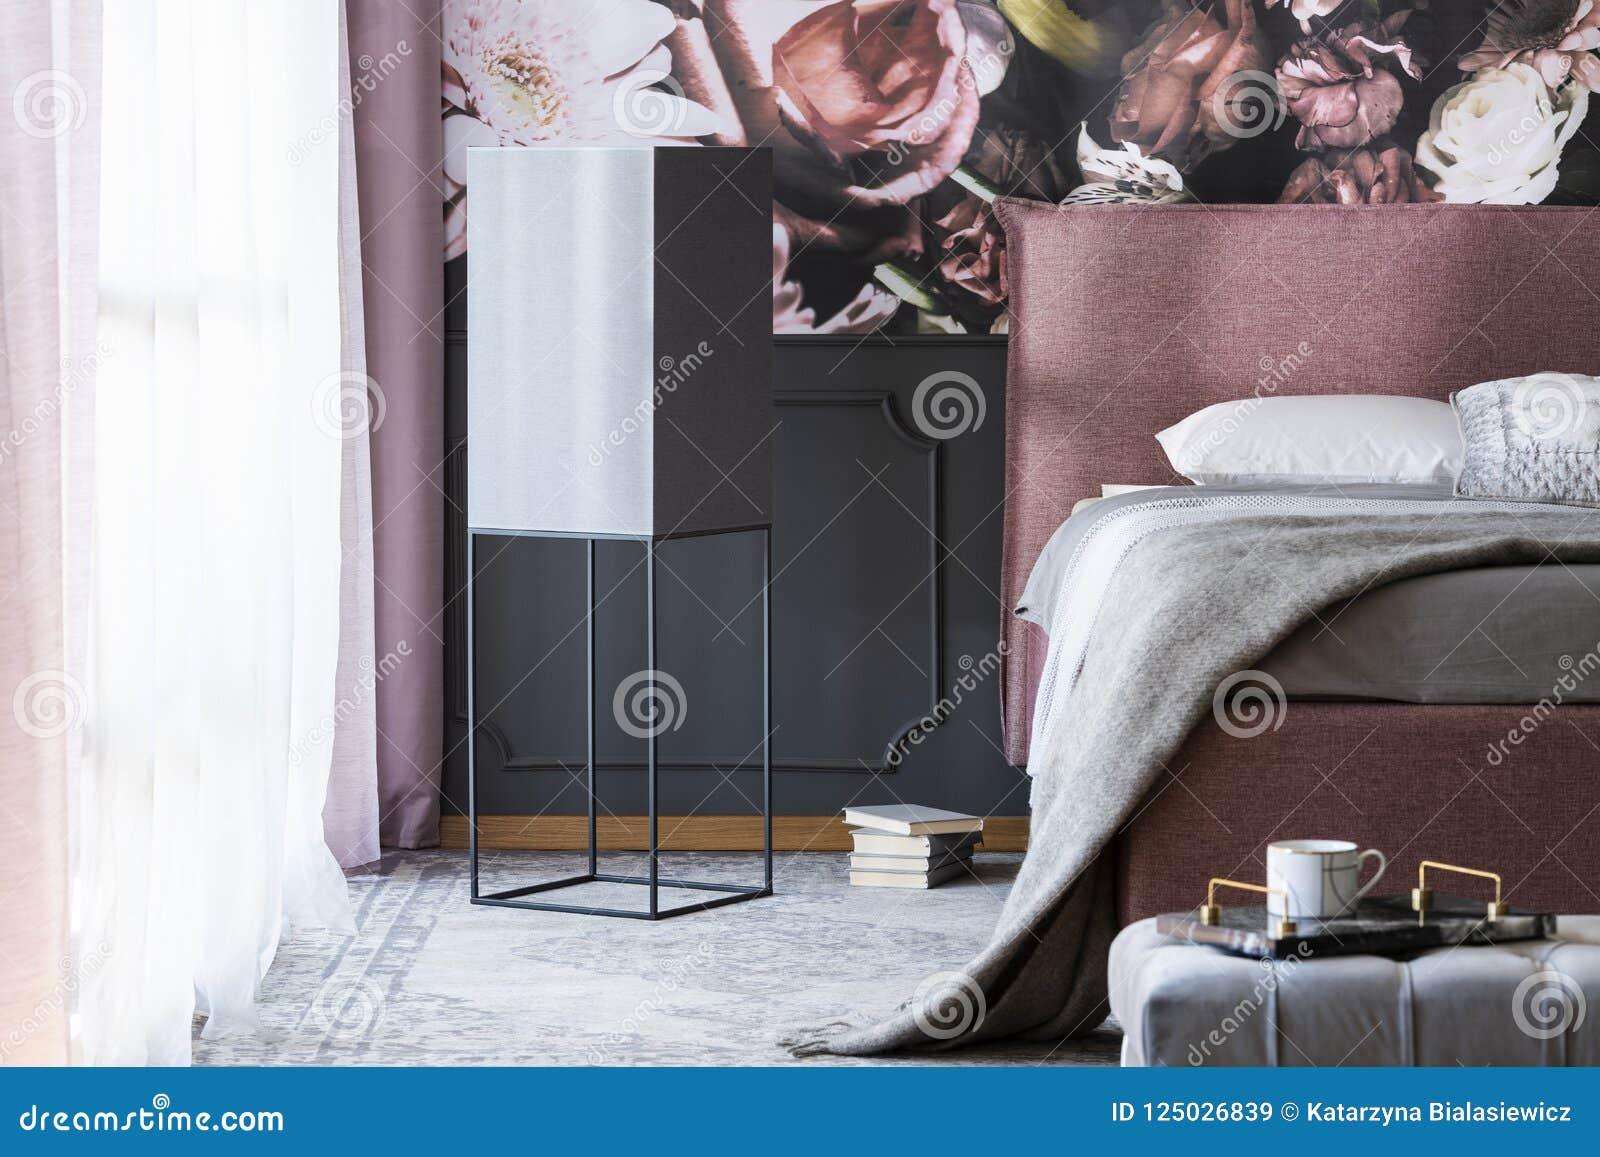 Roze Grijze Slaapkamer : Grijze deken en hoofdkussens op roze bed in donkere slaapkamer